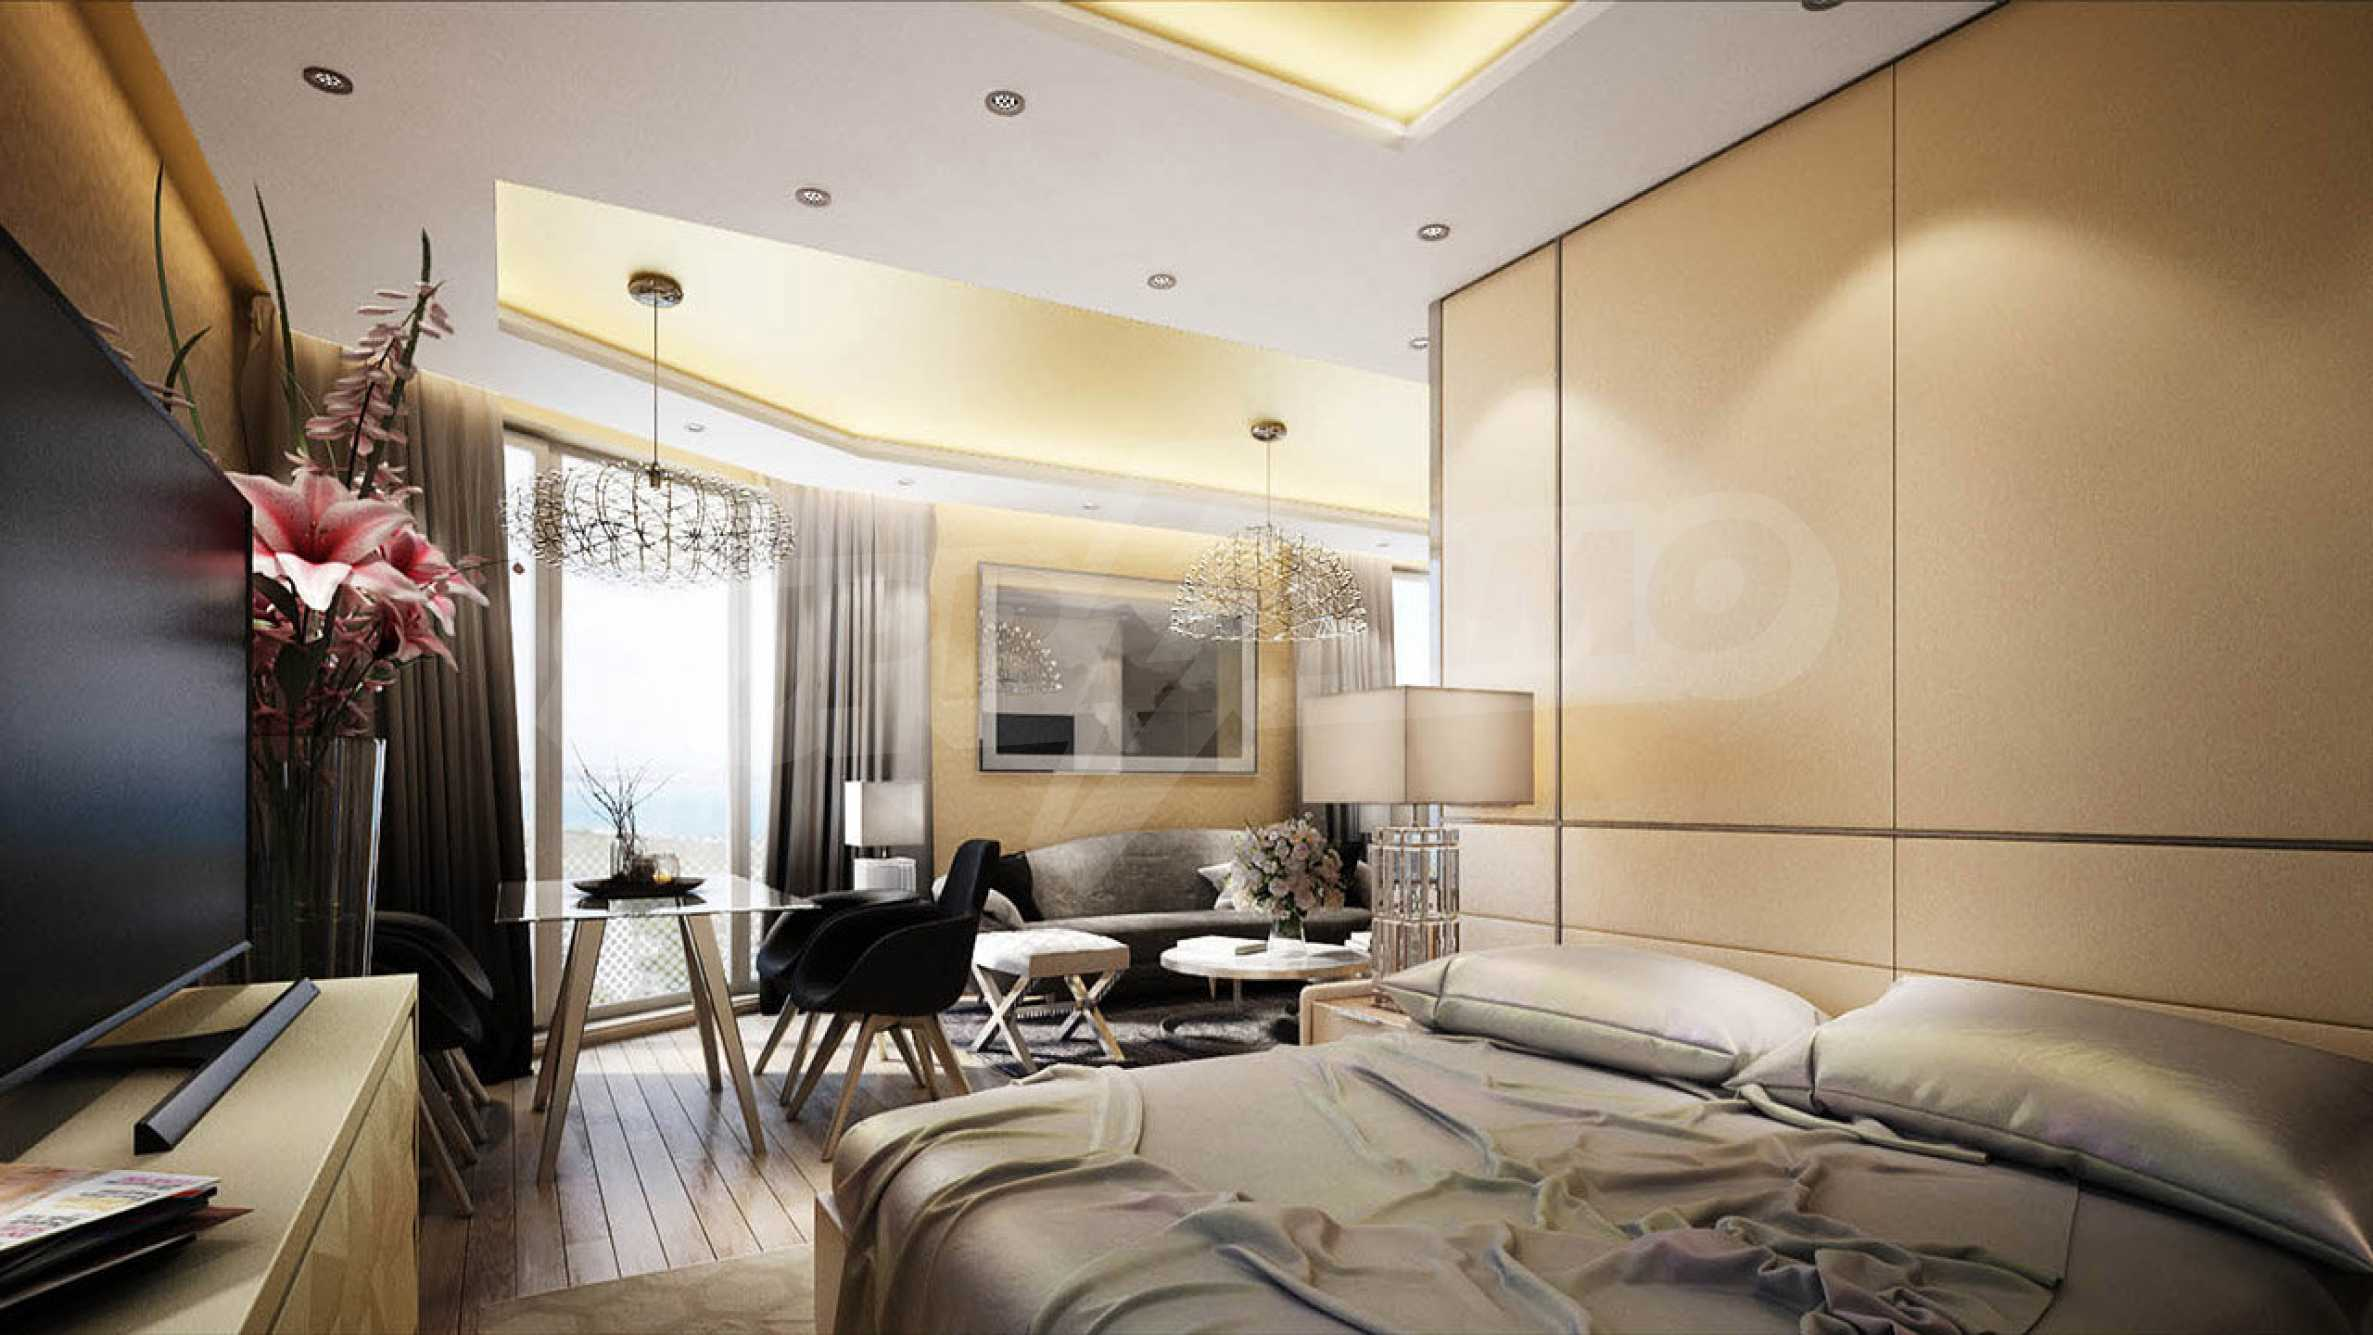 Нова сграда с луксозни апартаменти в гр. Бургас 12